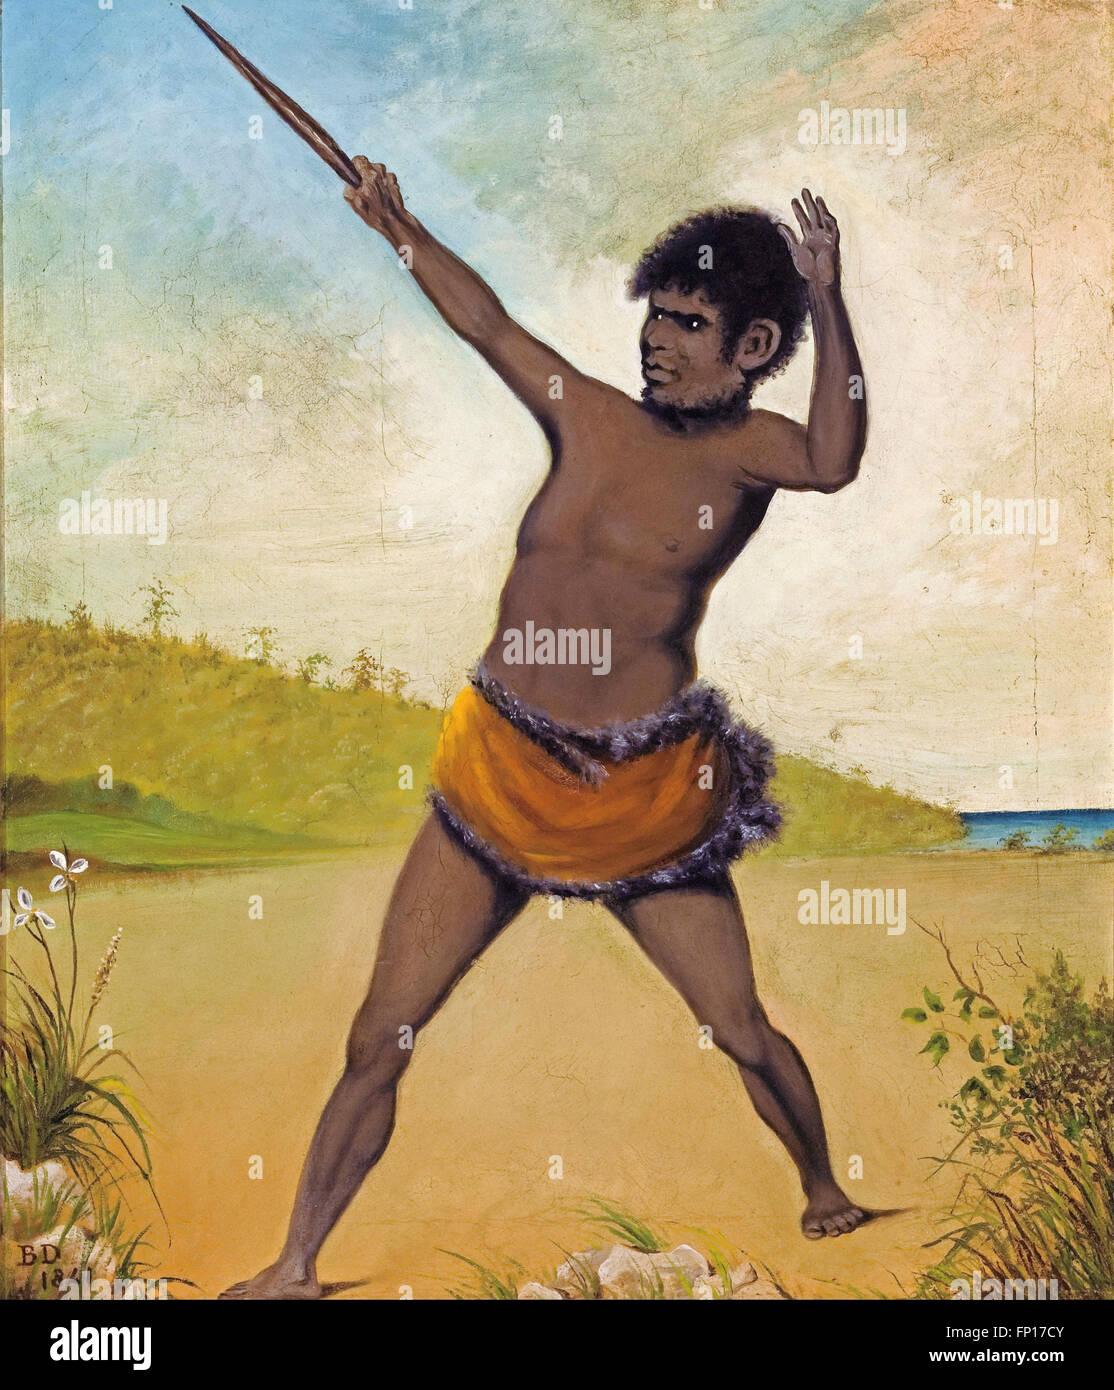 Benjamin Duterrau - Jack, a Tasmanian Aboriginal, holding a club - Stock Image